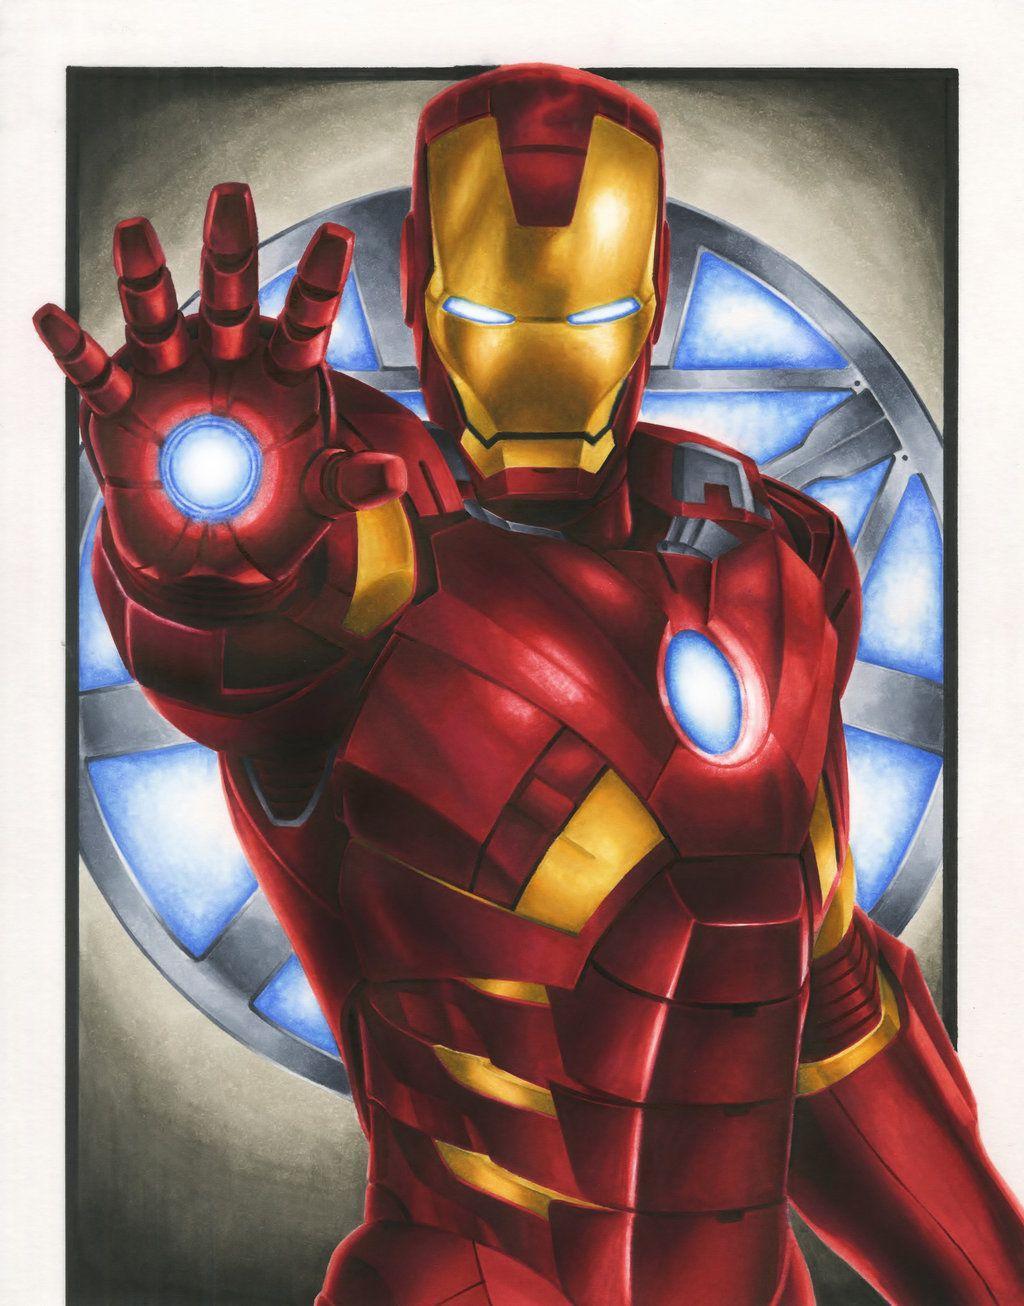 Tony stark cartoon wallpapers wallpaper cave - Iron man cartoon wallpaper ...